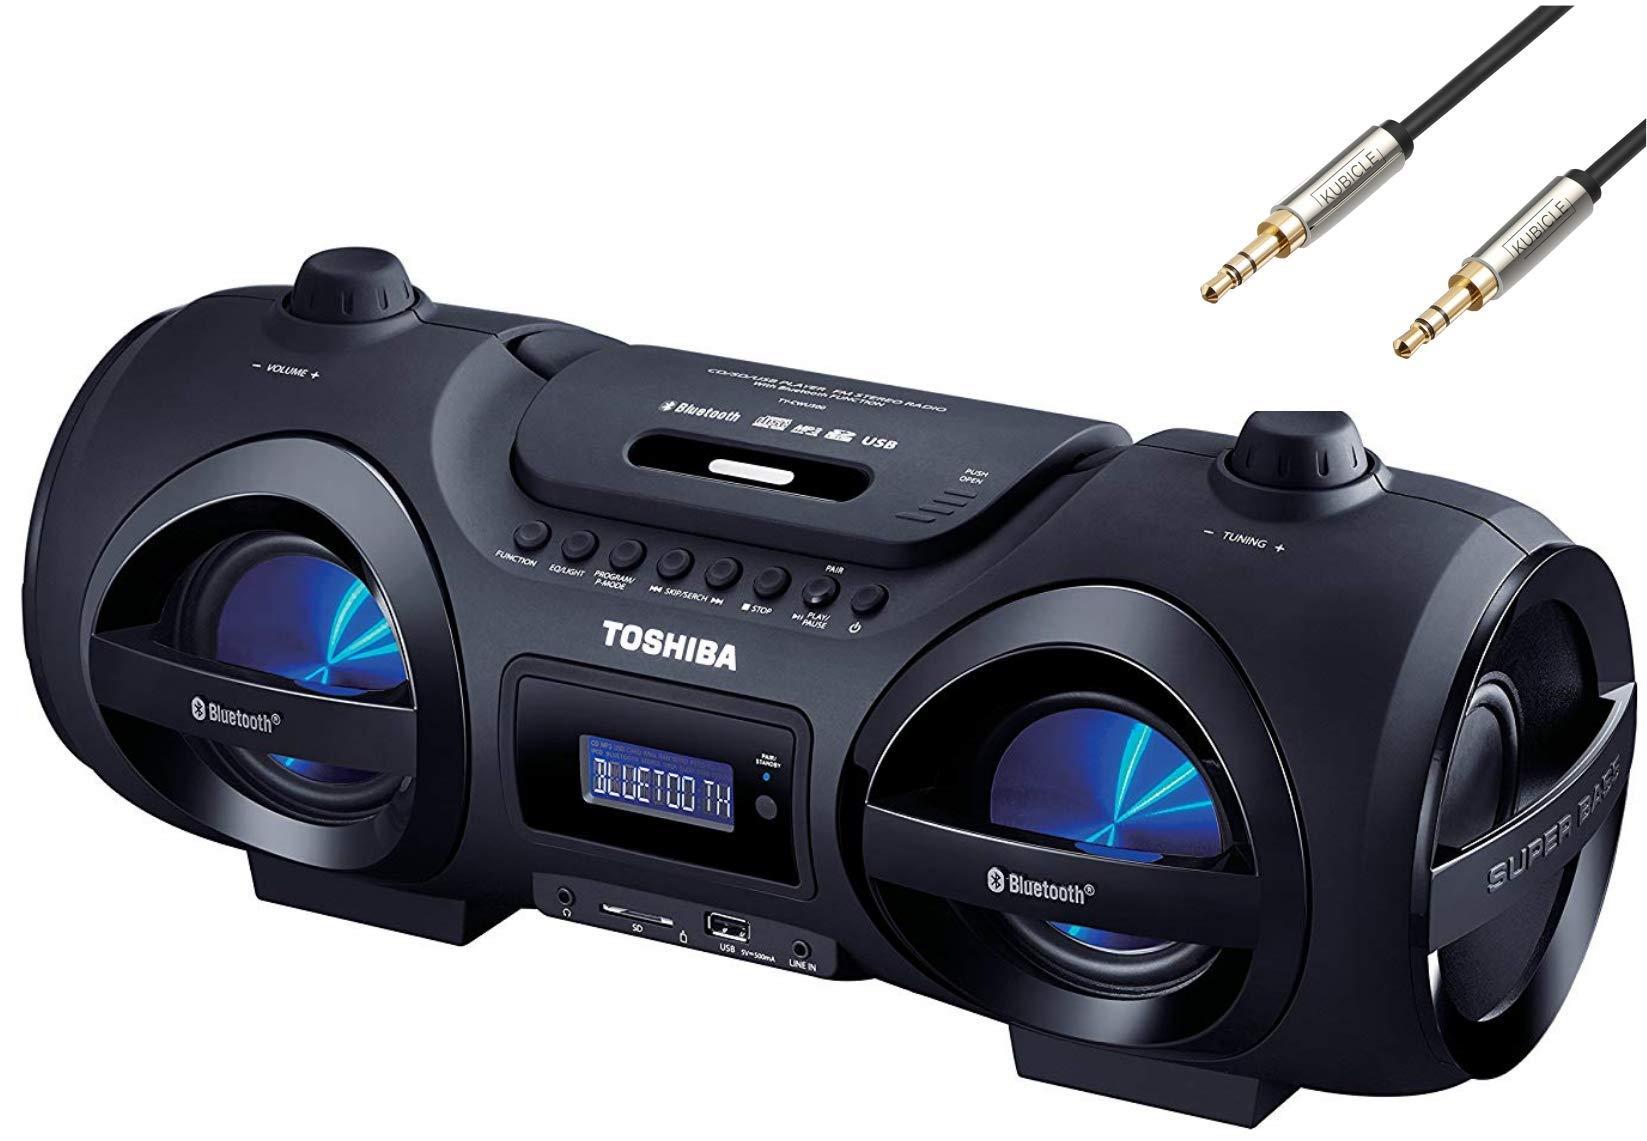 Toshiba Portable Digital Tuner AM/FM Radio Cd Player Mega Bass Reflex Stereo Sound System Plus 6ft Kubicle Aux Cable (Bundle)